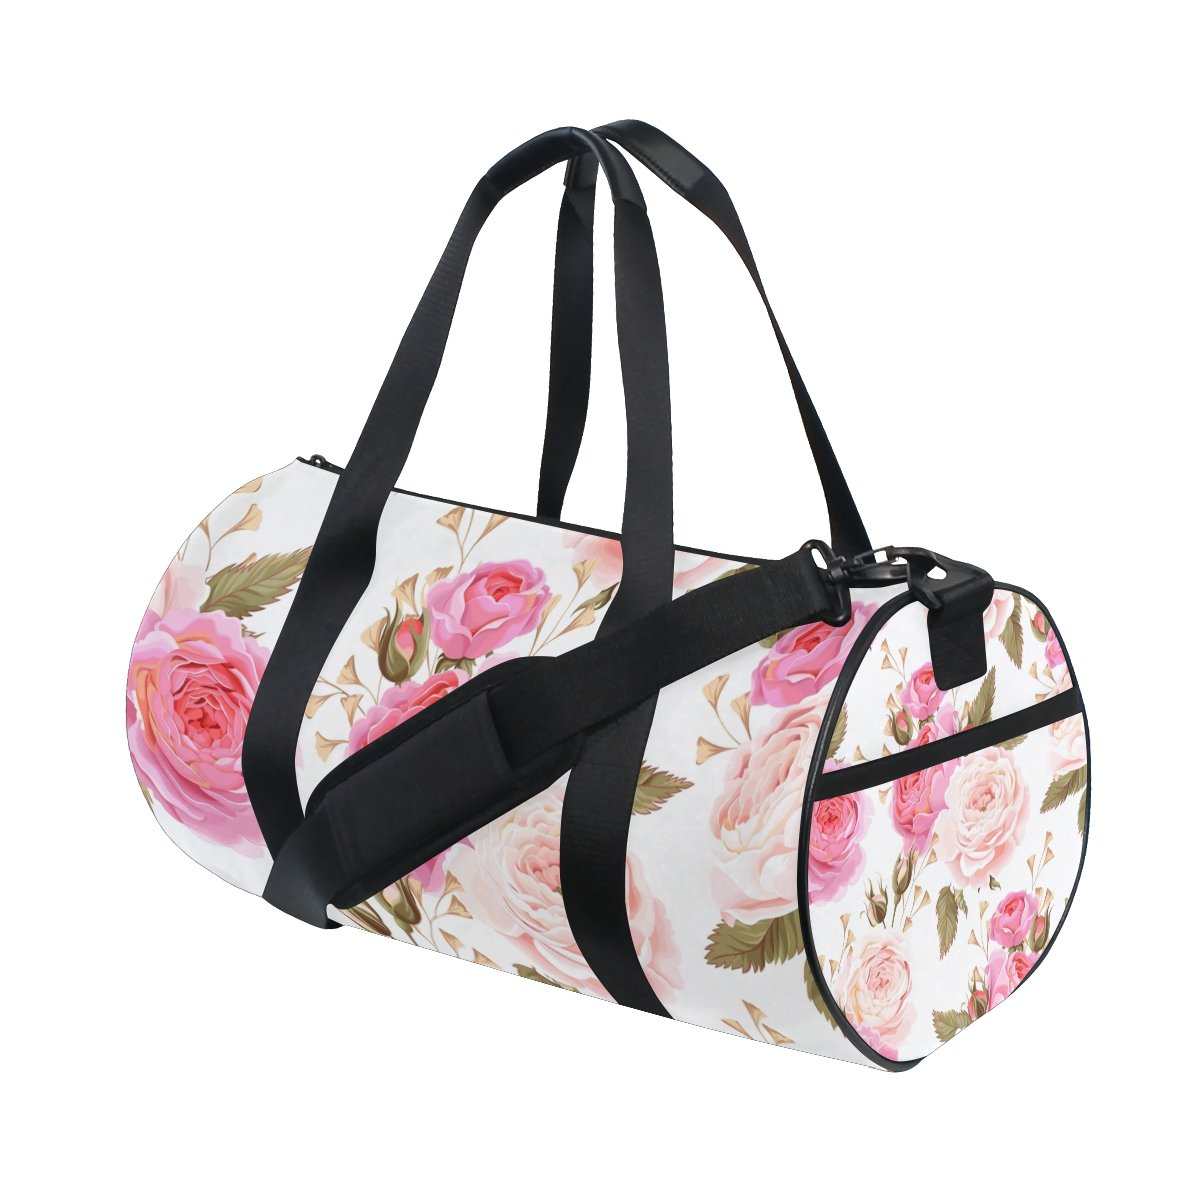 U LIFE Vintage Summer Spring Floral Peony Flowers Sports Gym Shoulder Handy Duffel Bags for Women Men Kids Boys Girls